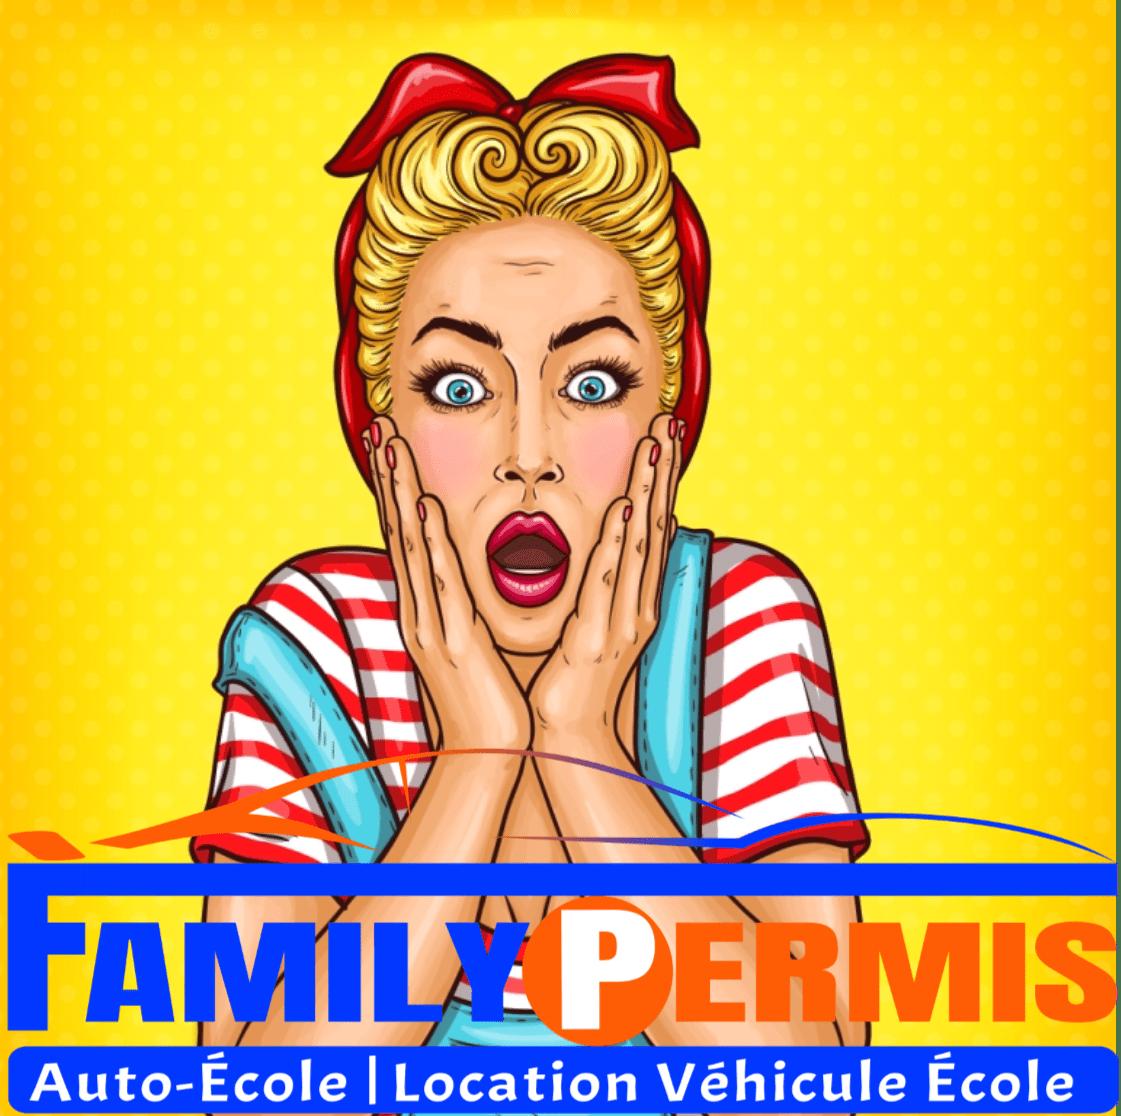 FAMILY PERMIS : Auto-Ecole / Location Véhicule Ecole Double Commande